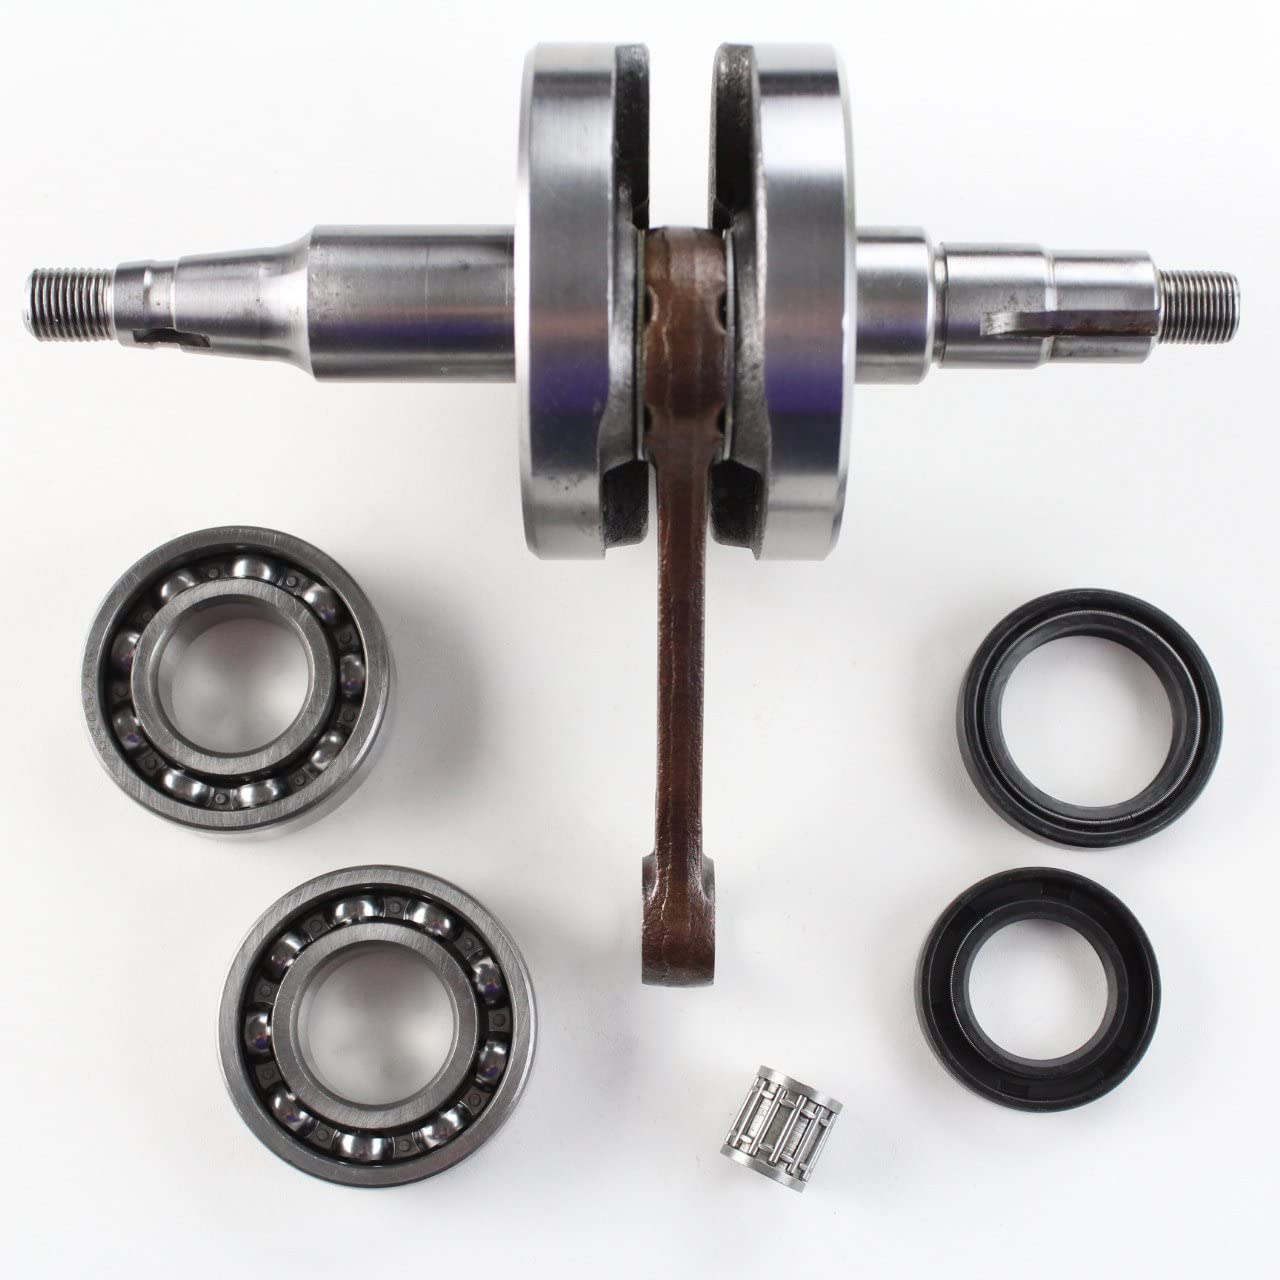 NICHE Crankshaft Assembly for Yamaha PW80 Y-Zinger 1983-2006